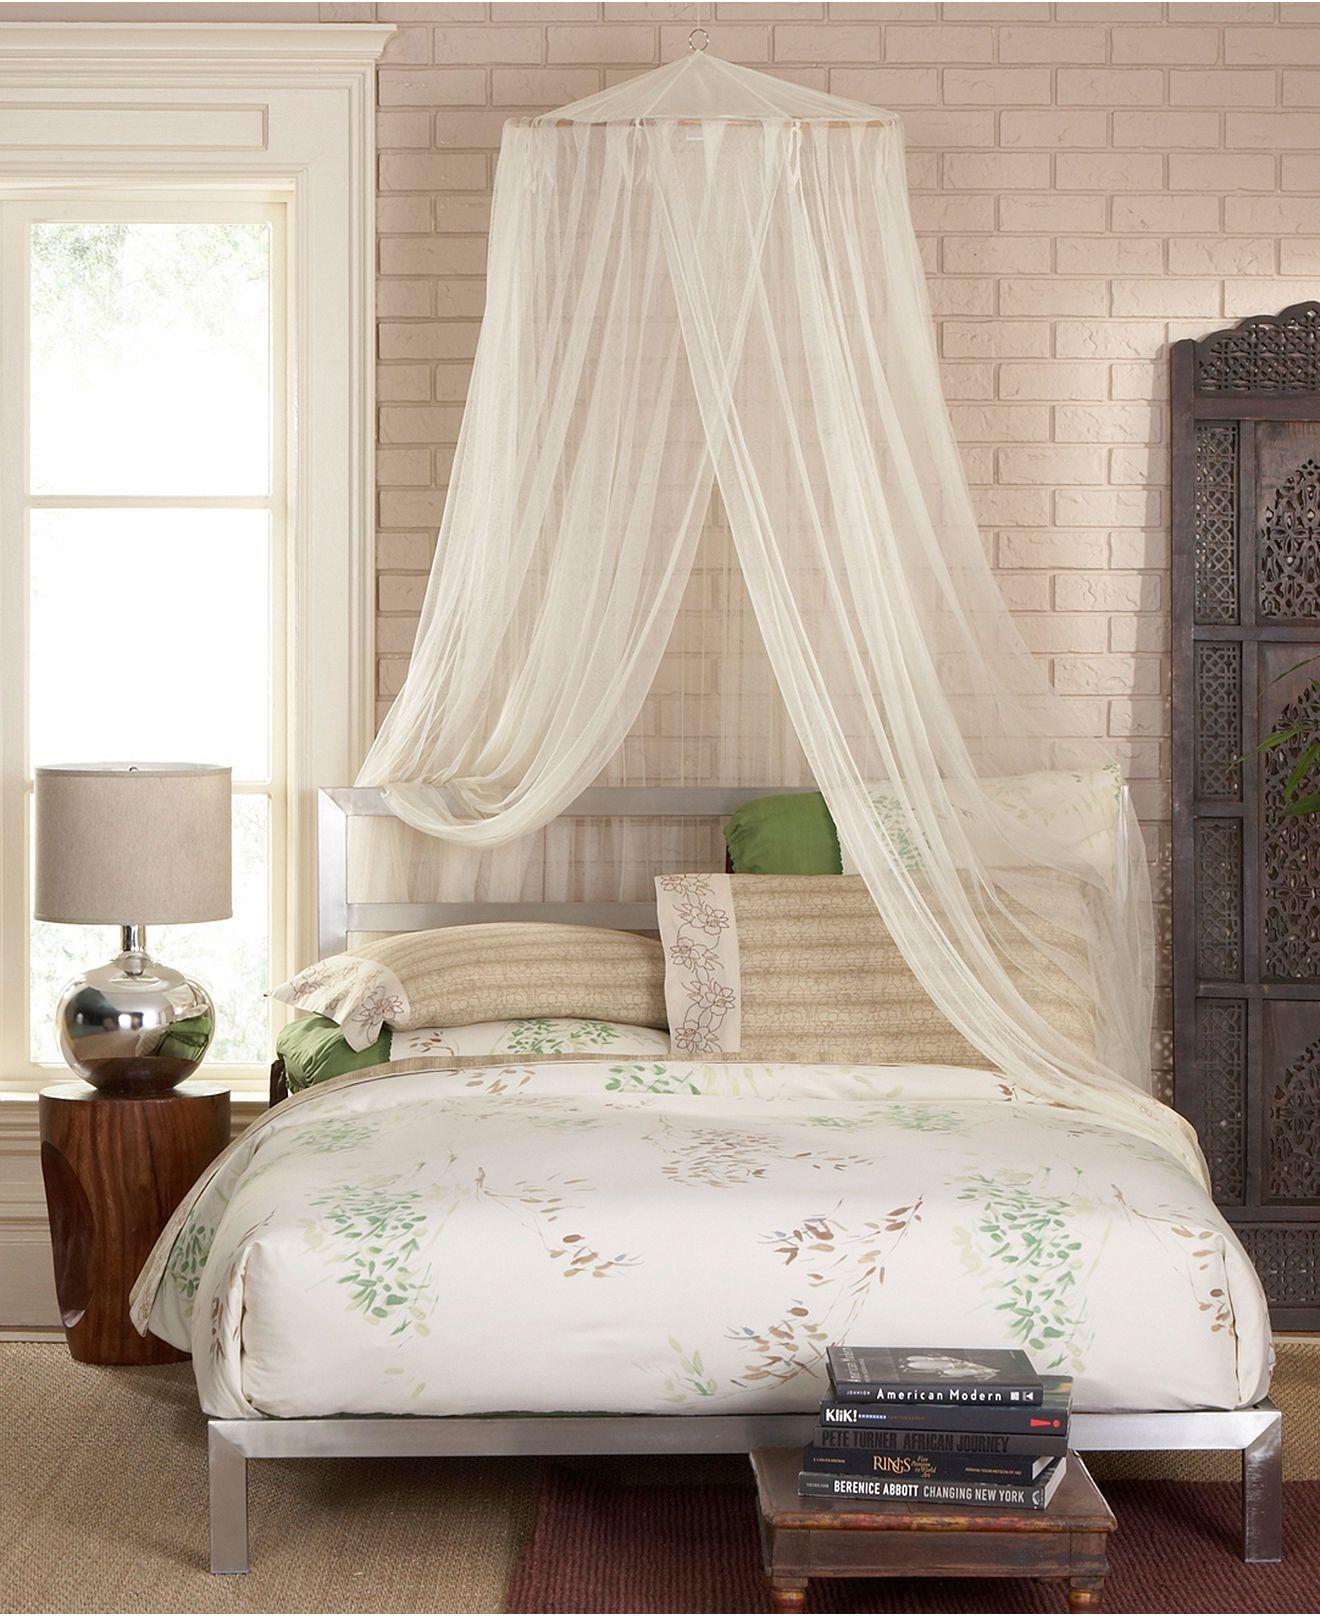 Bedding, Siam Canopy